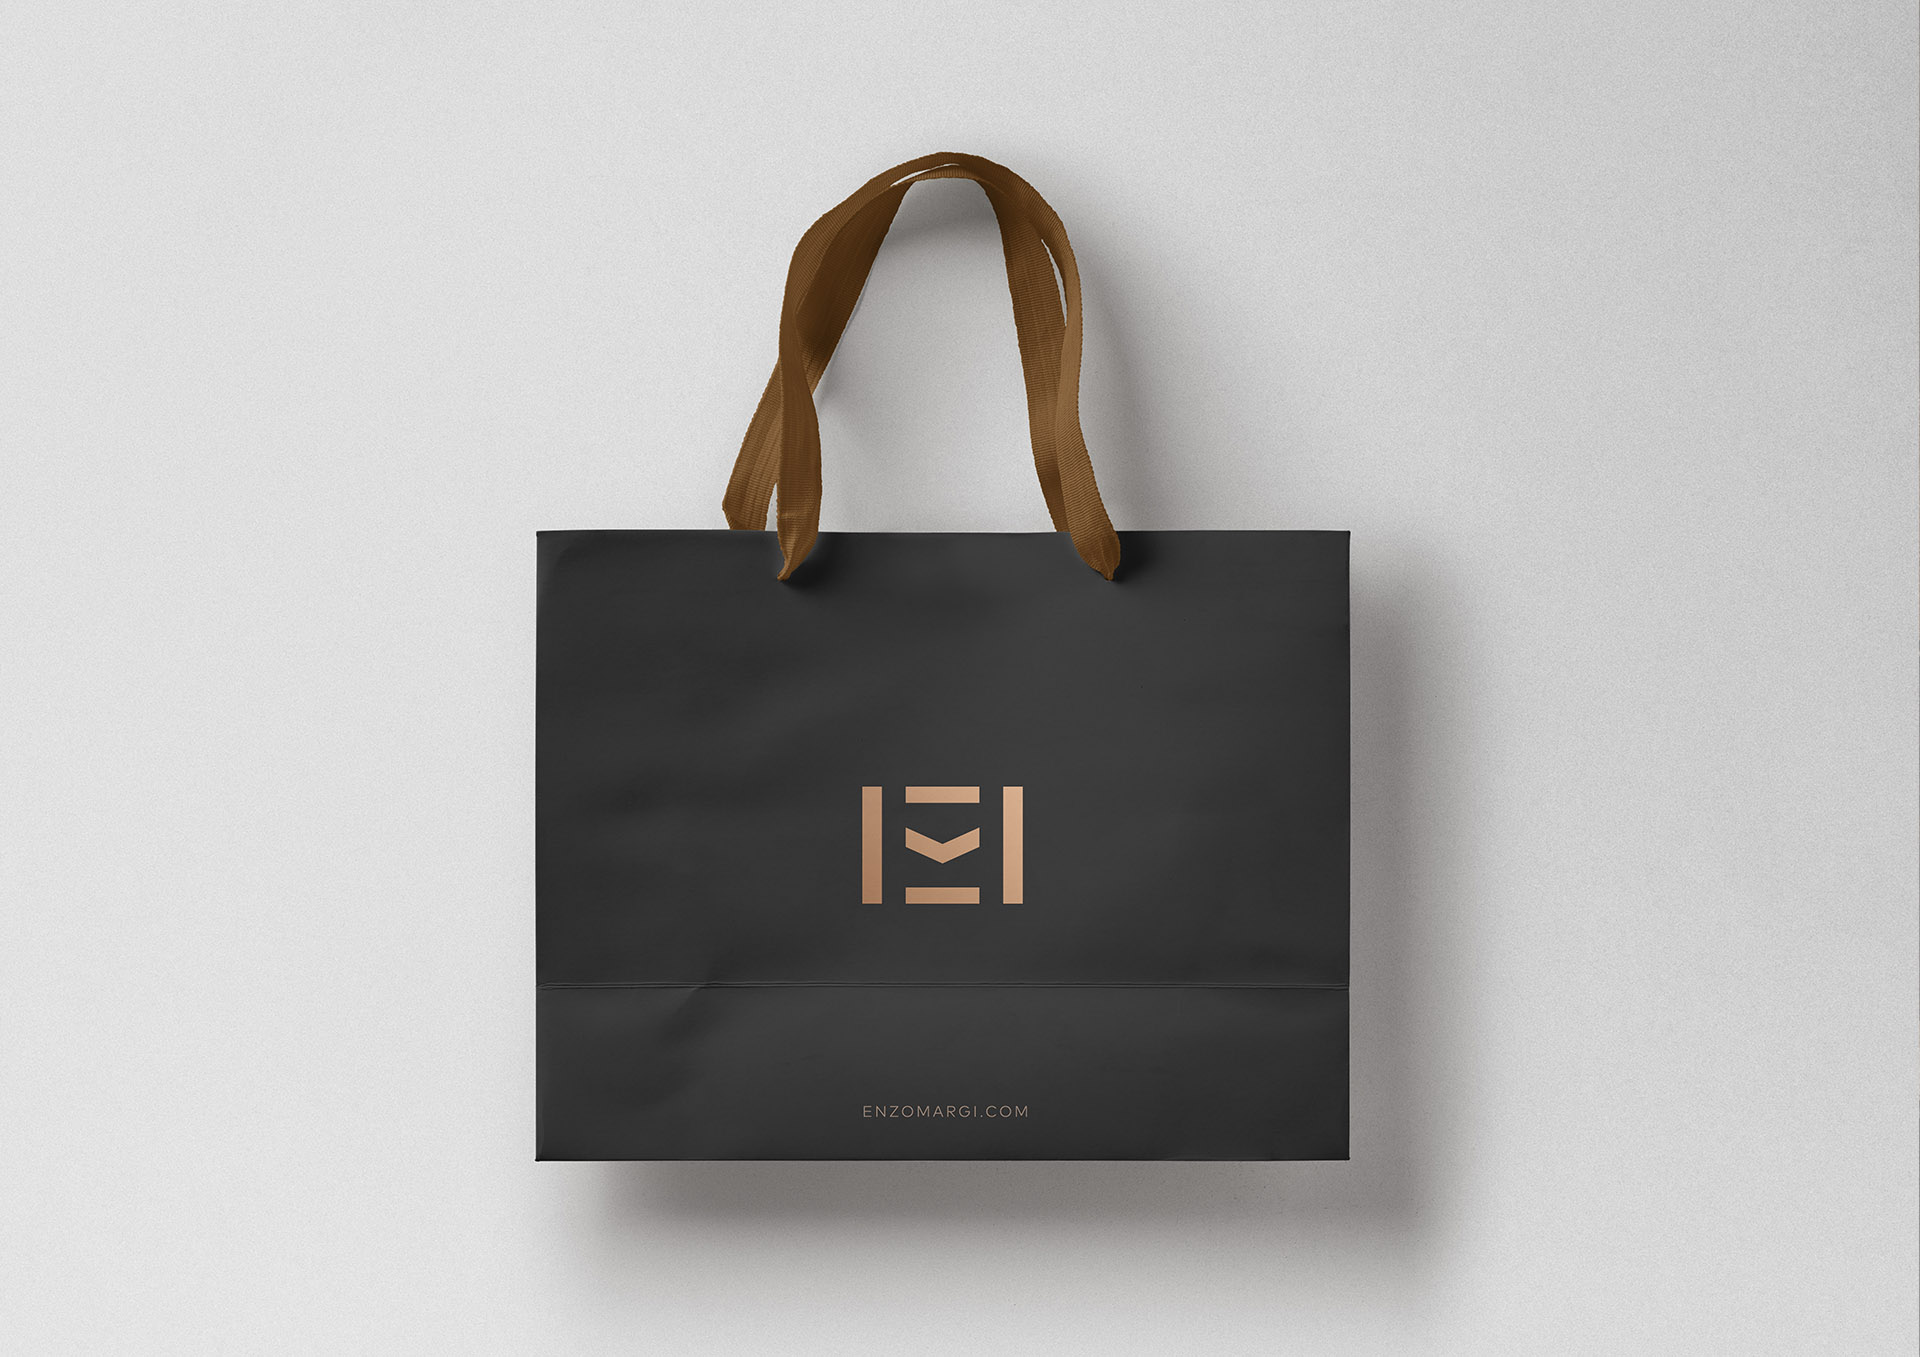 enzo margi portfolio inoveo paper bag